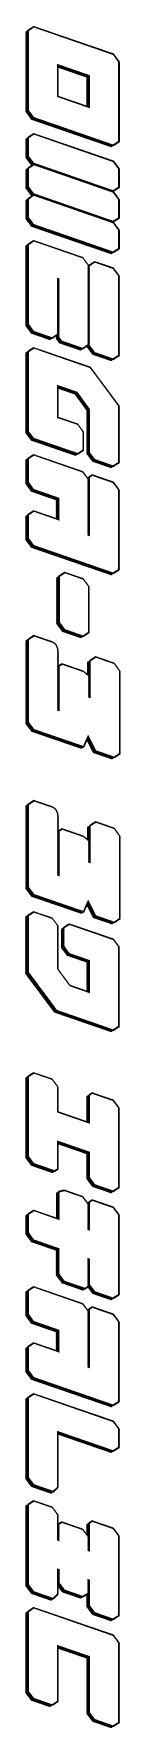 Quality free retro font available on Fonts2u. Download Trinigan FG at http://www.fonts2u.com/trinigan-fg.font